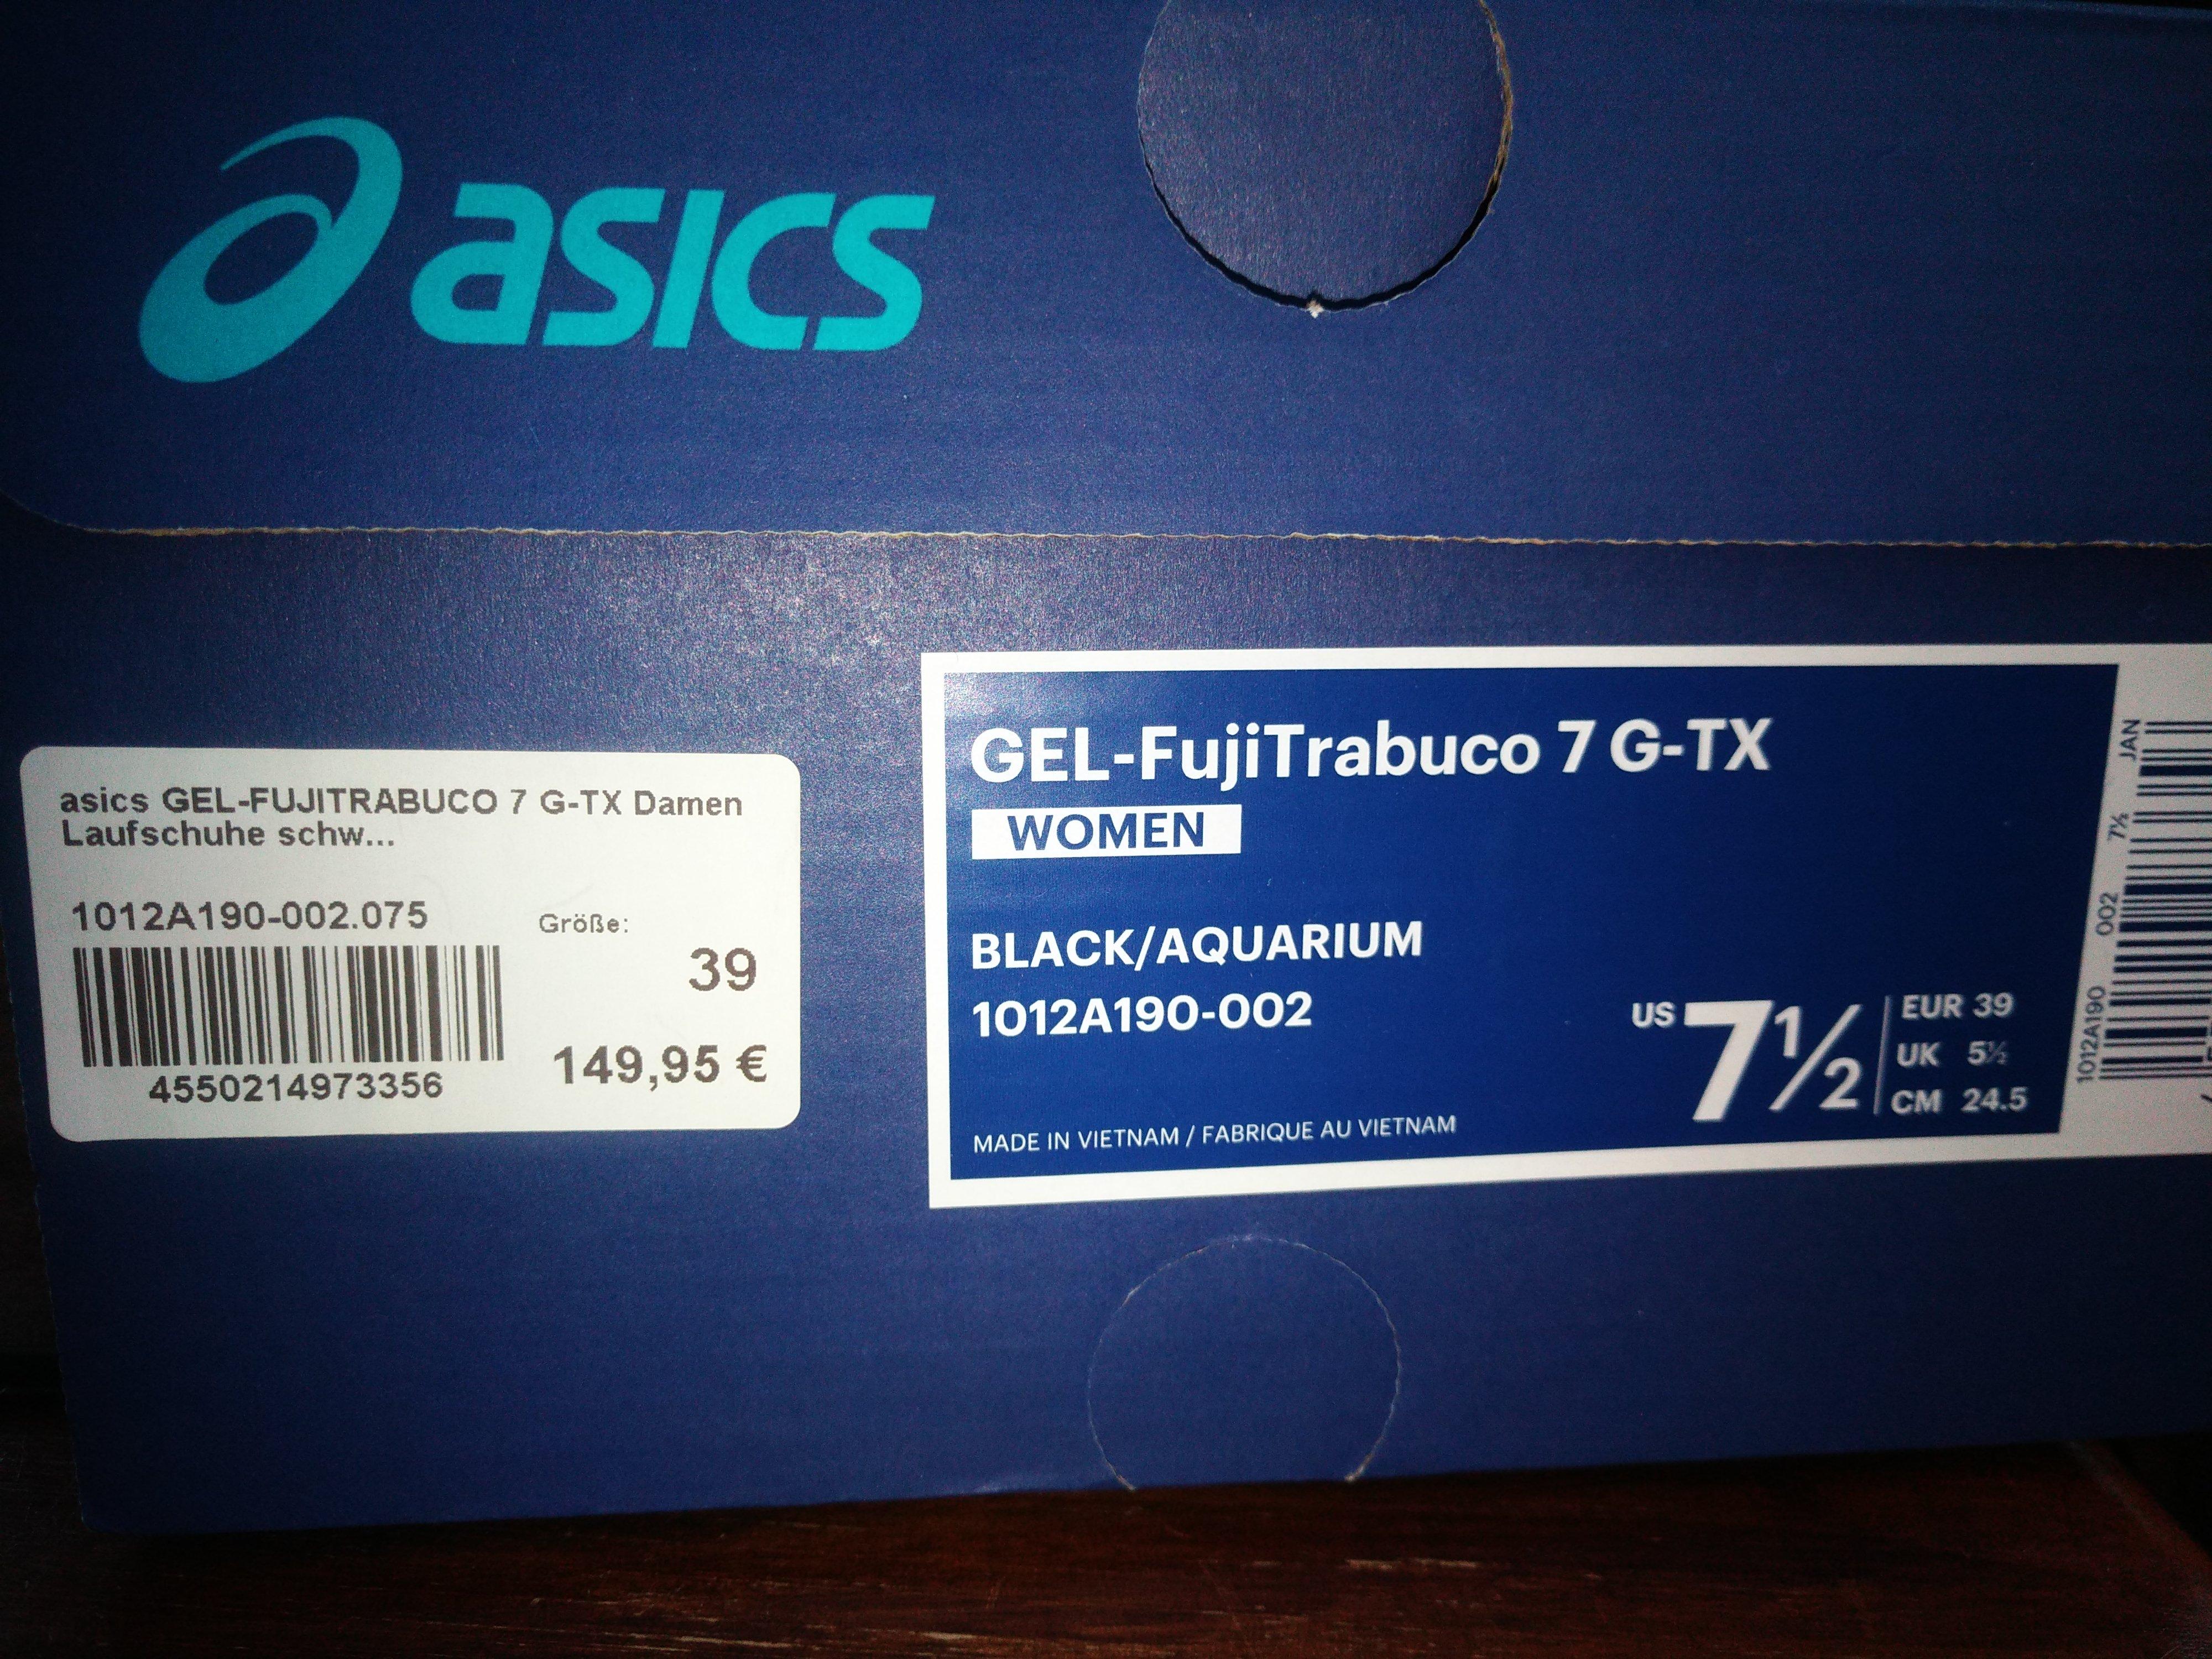 Bild Nummer 5 von ASICS, Gel-Fujitrabuco 7 G-tx, Laufschuh, black/ aquarium, Damen